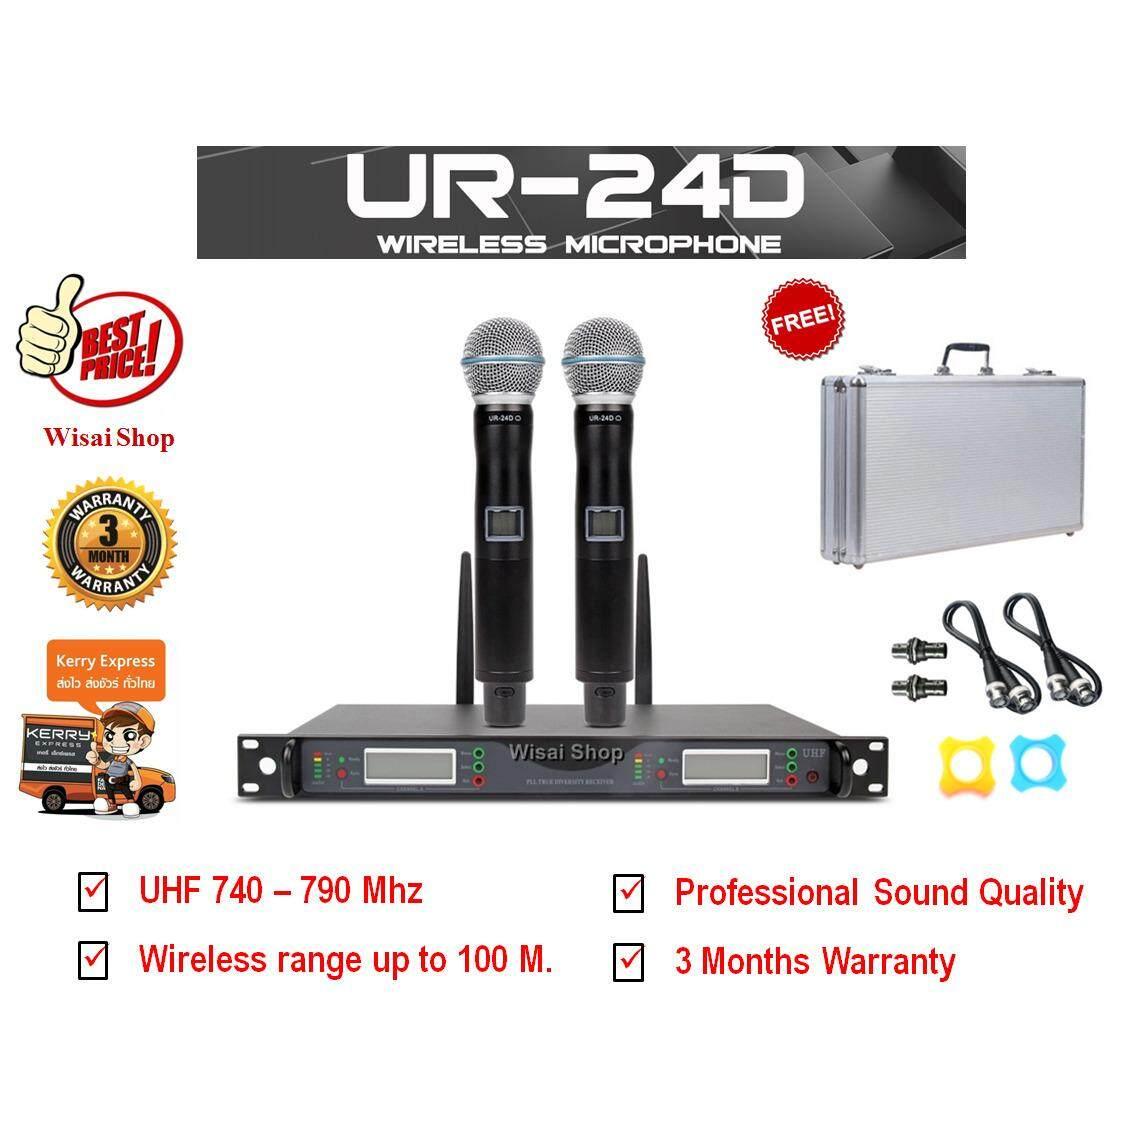 Wireless Microphone ชุดไมค์ลอยคู่ รุ่น UR24D / BETA58 คลื่น UHF 740-790mhz คุณภาพเสียงระดับมืออาชีพ